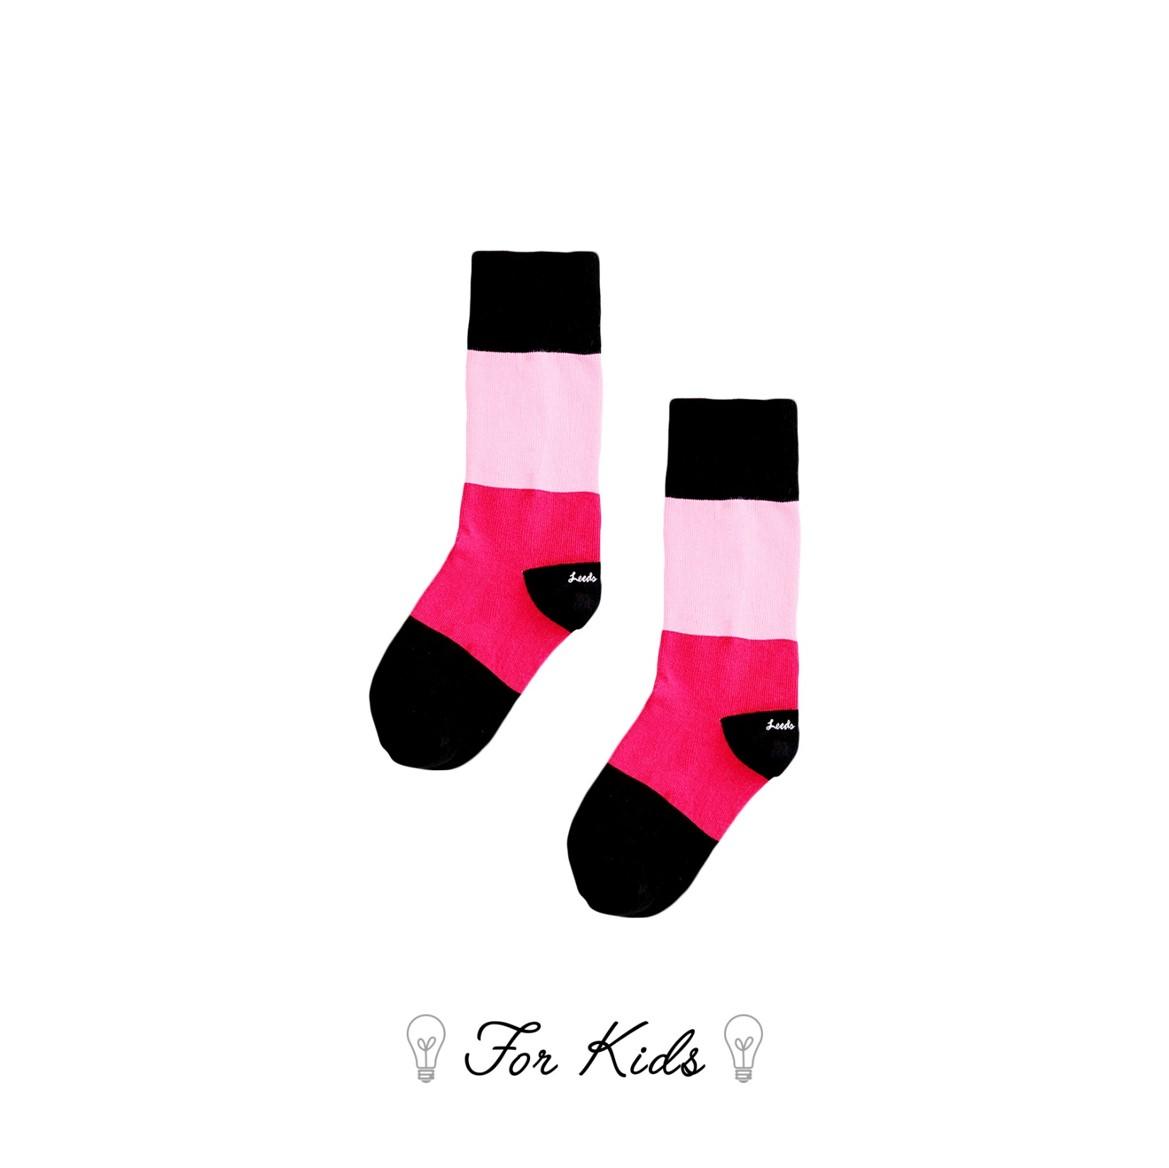 Leeds weather【英國設計】天然純棉孩童襪子★繽紛色彩拼接襪子【Cotton Socks Recommendations】- Routemaster ( A todo color系列共5款 ) 皇室孩童御用推薦、可愛穿搭、透氣舒適耐洗